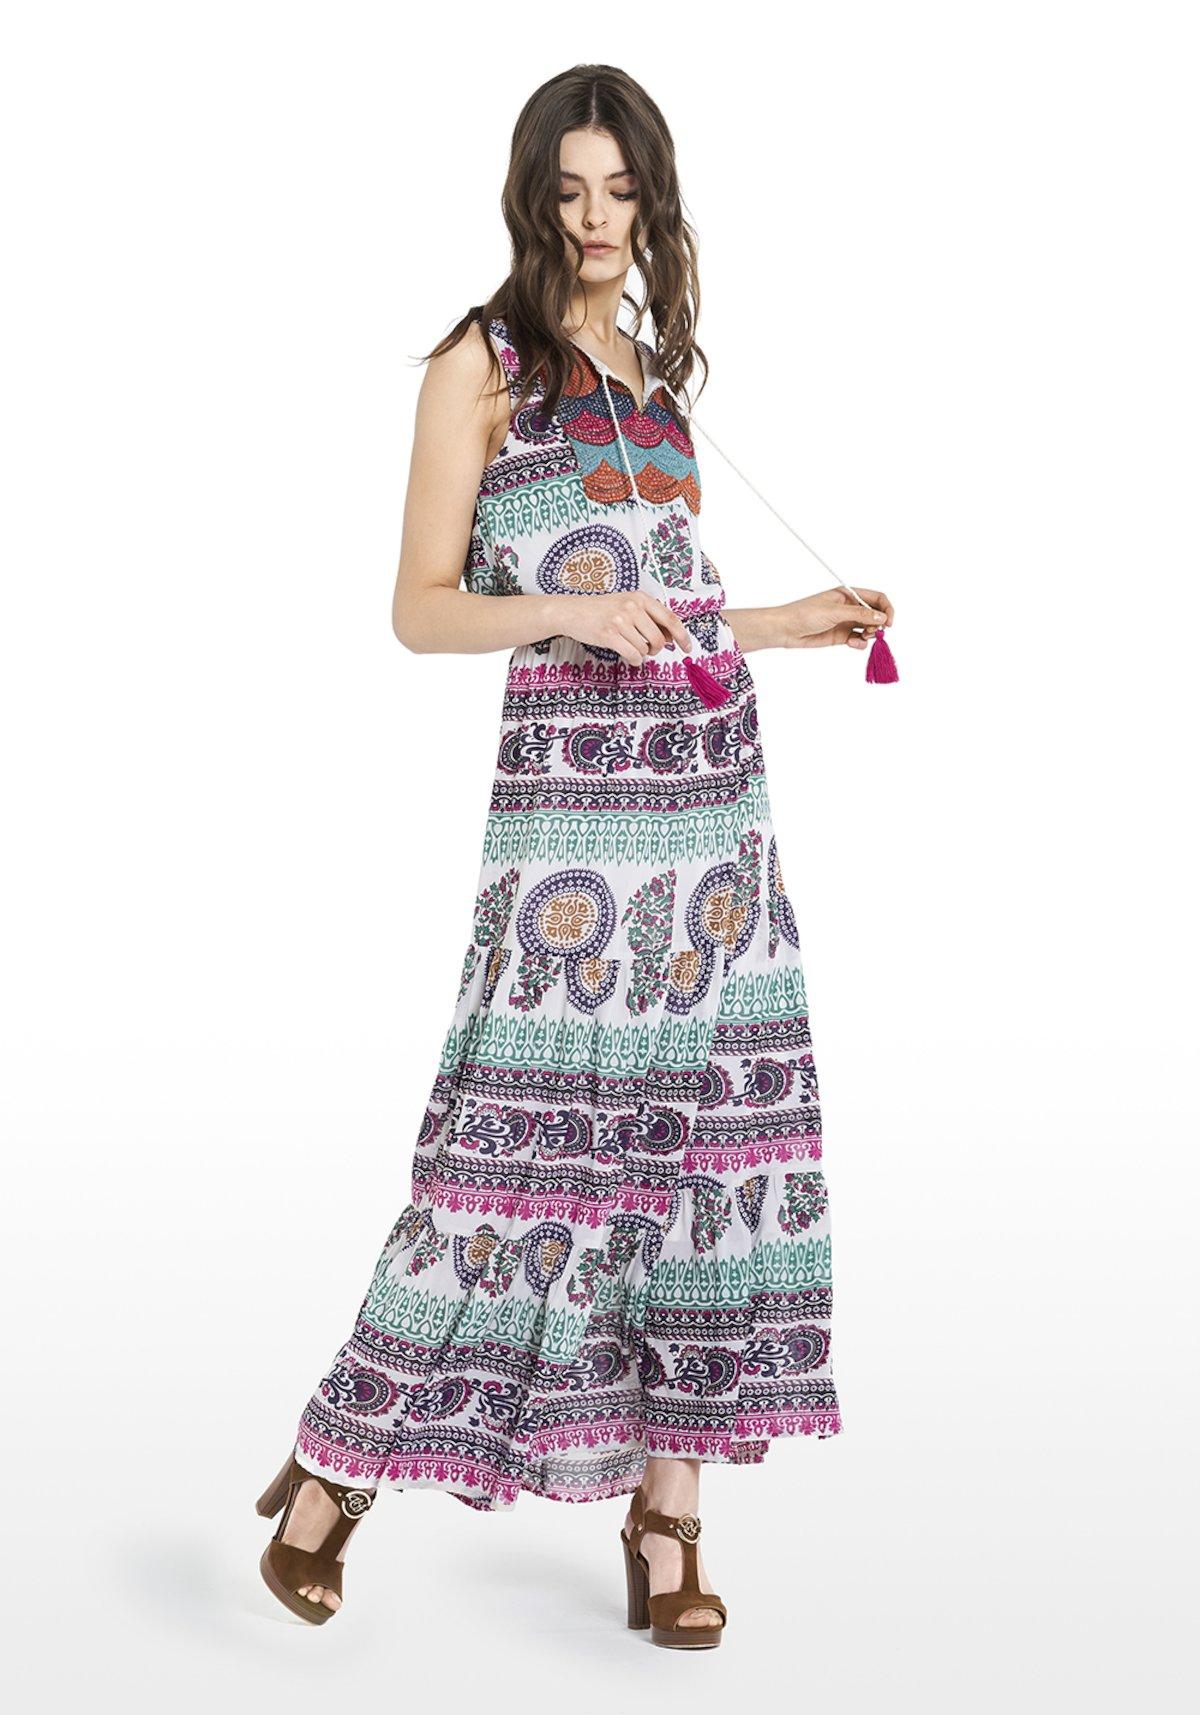 Sleeveless Abel dress multicolour fantasy and small stones on the front - White\ Peonia\ Fantasia - Woman